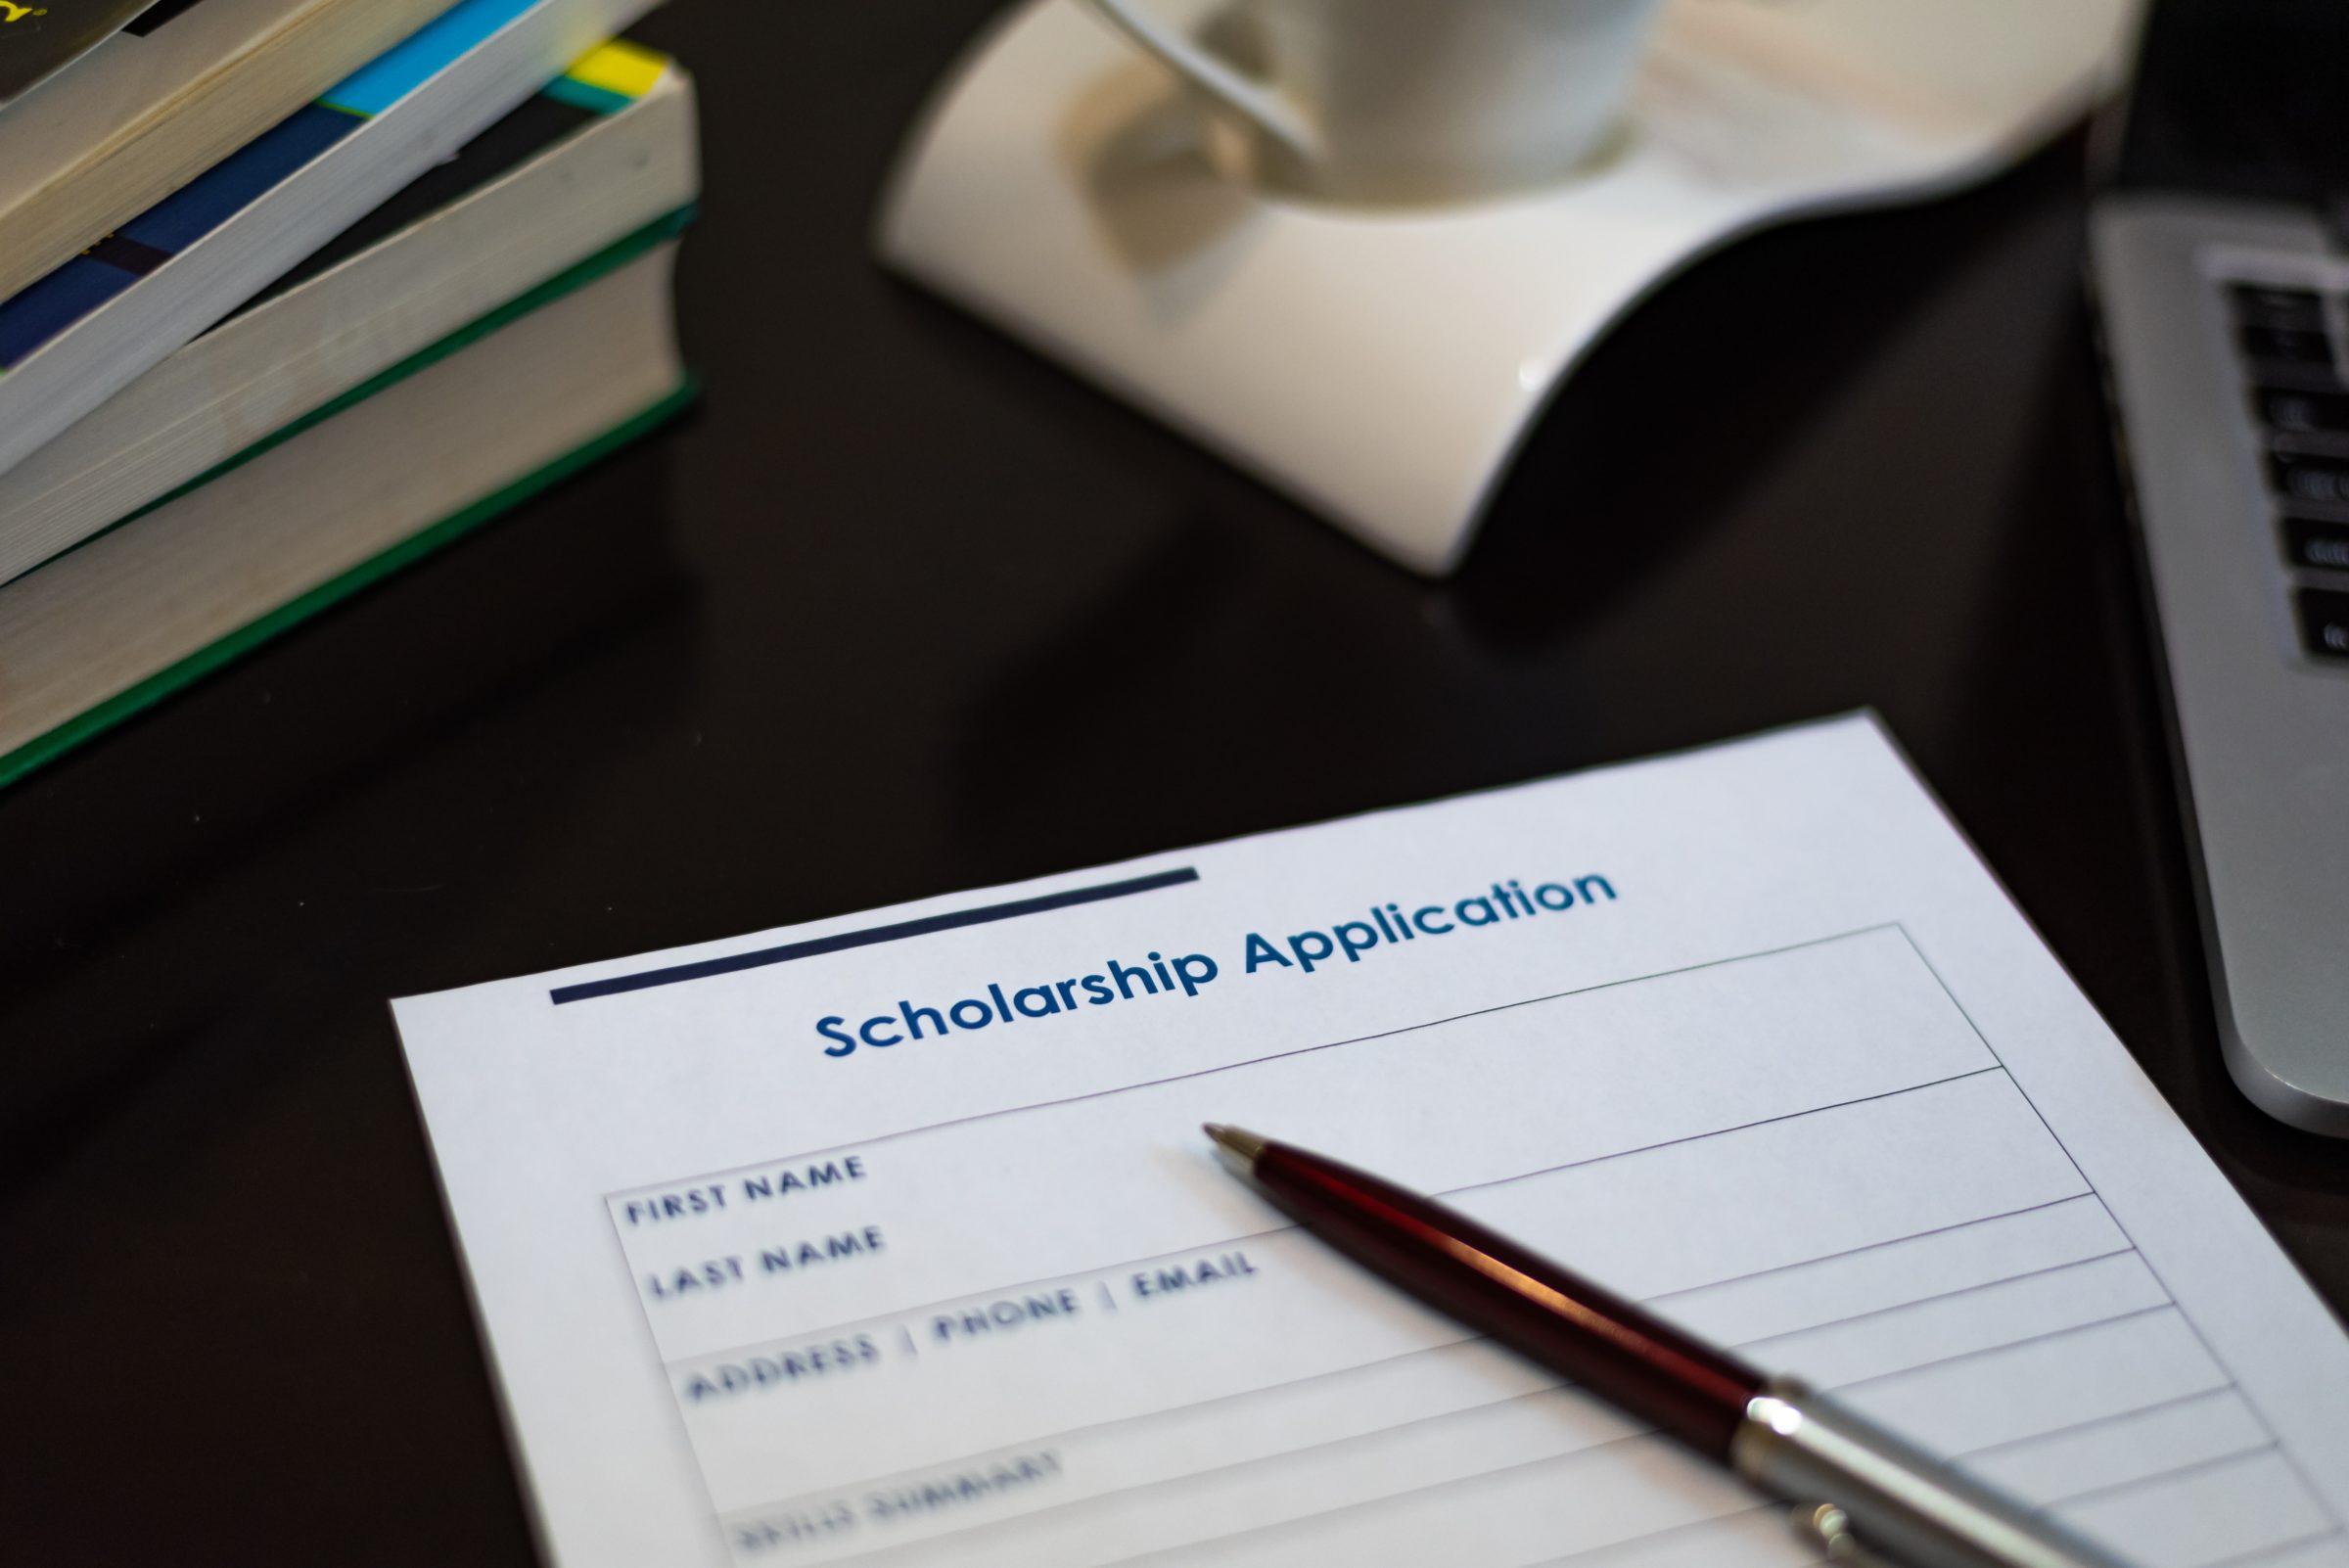 scholarship application form E6WUHDP